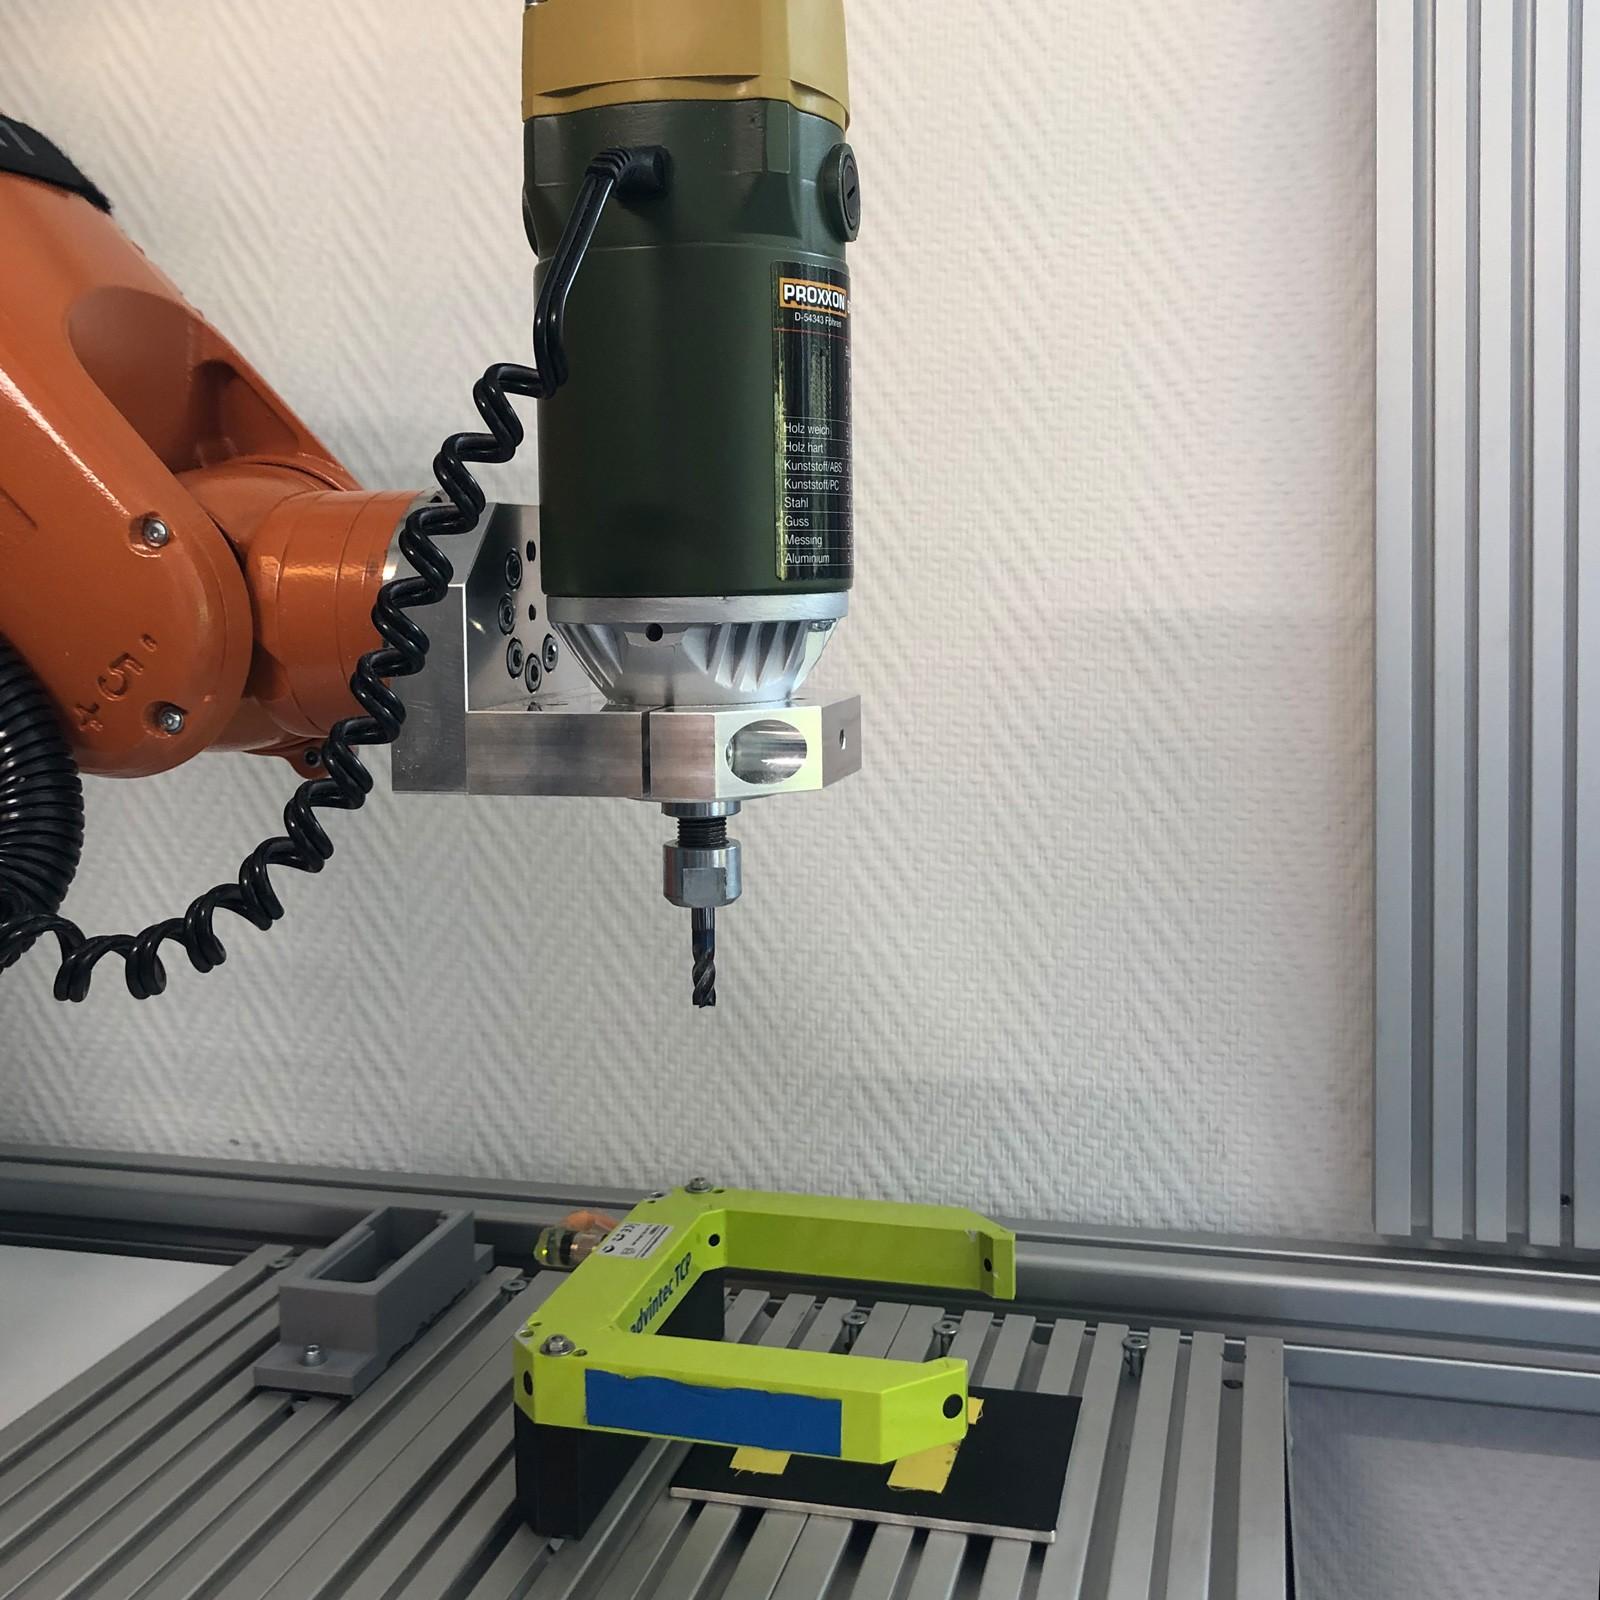 Robotics Projekt Schüler für Kinder: Robooter